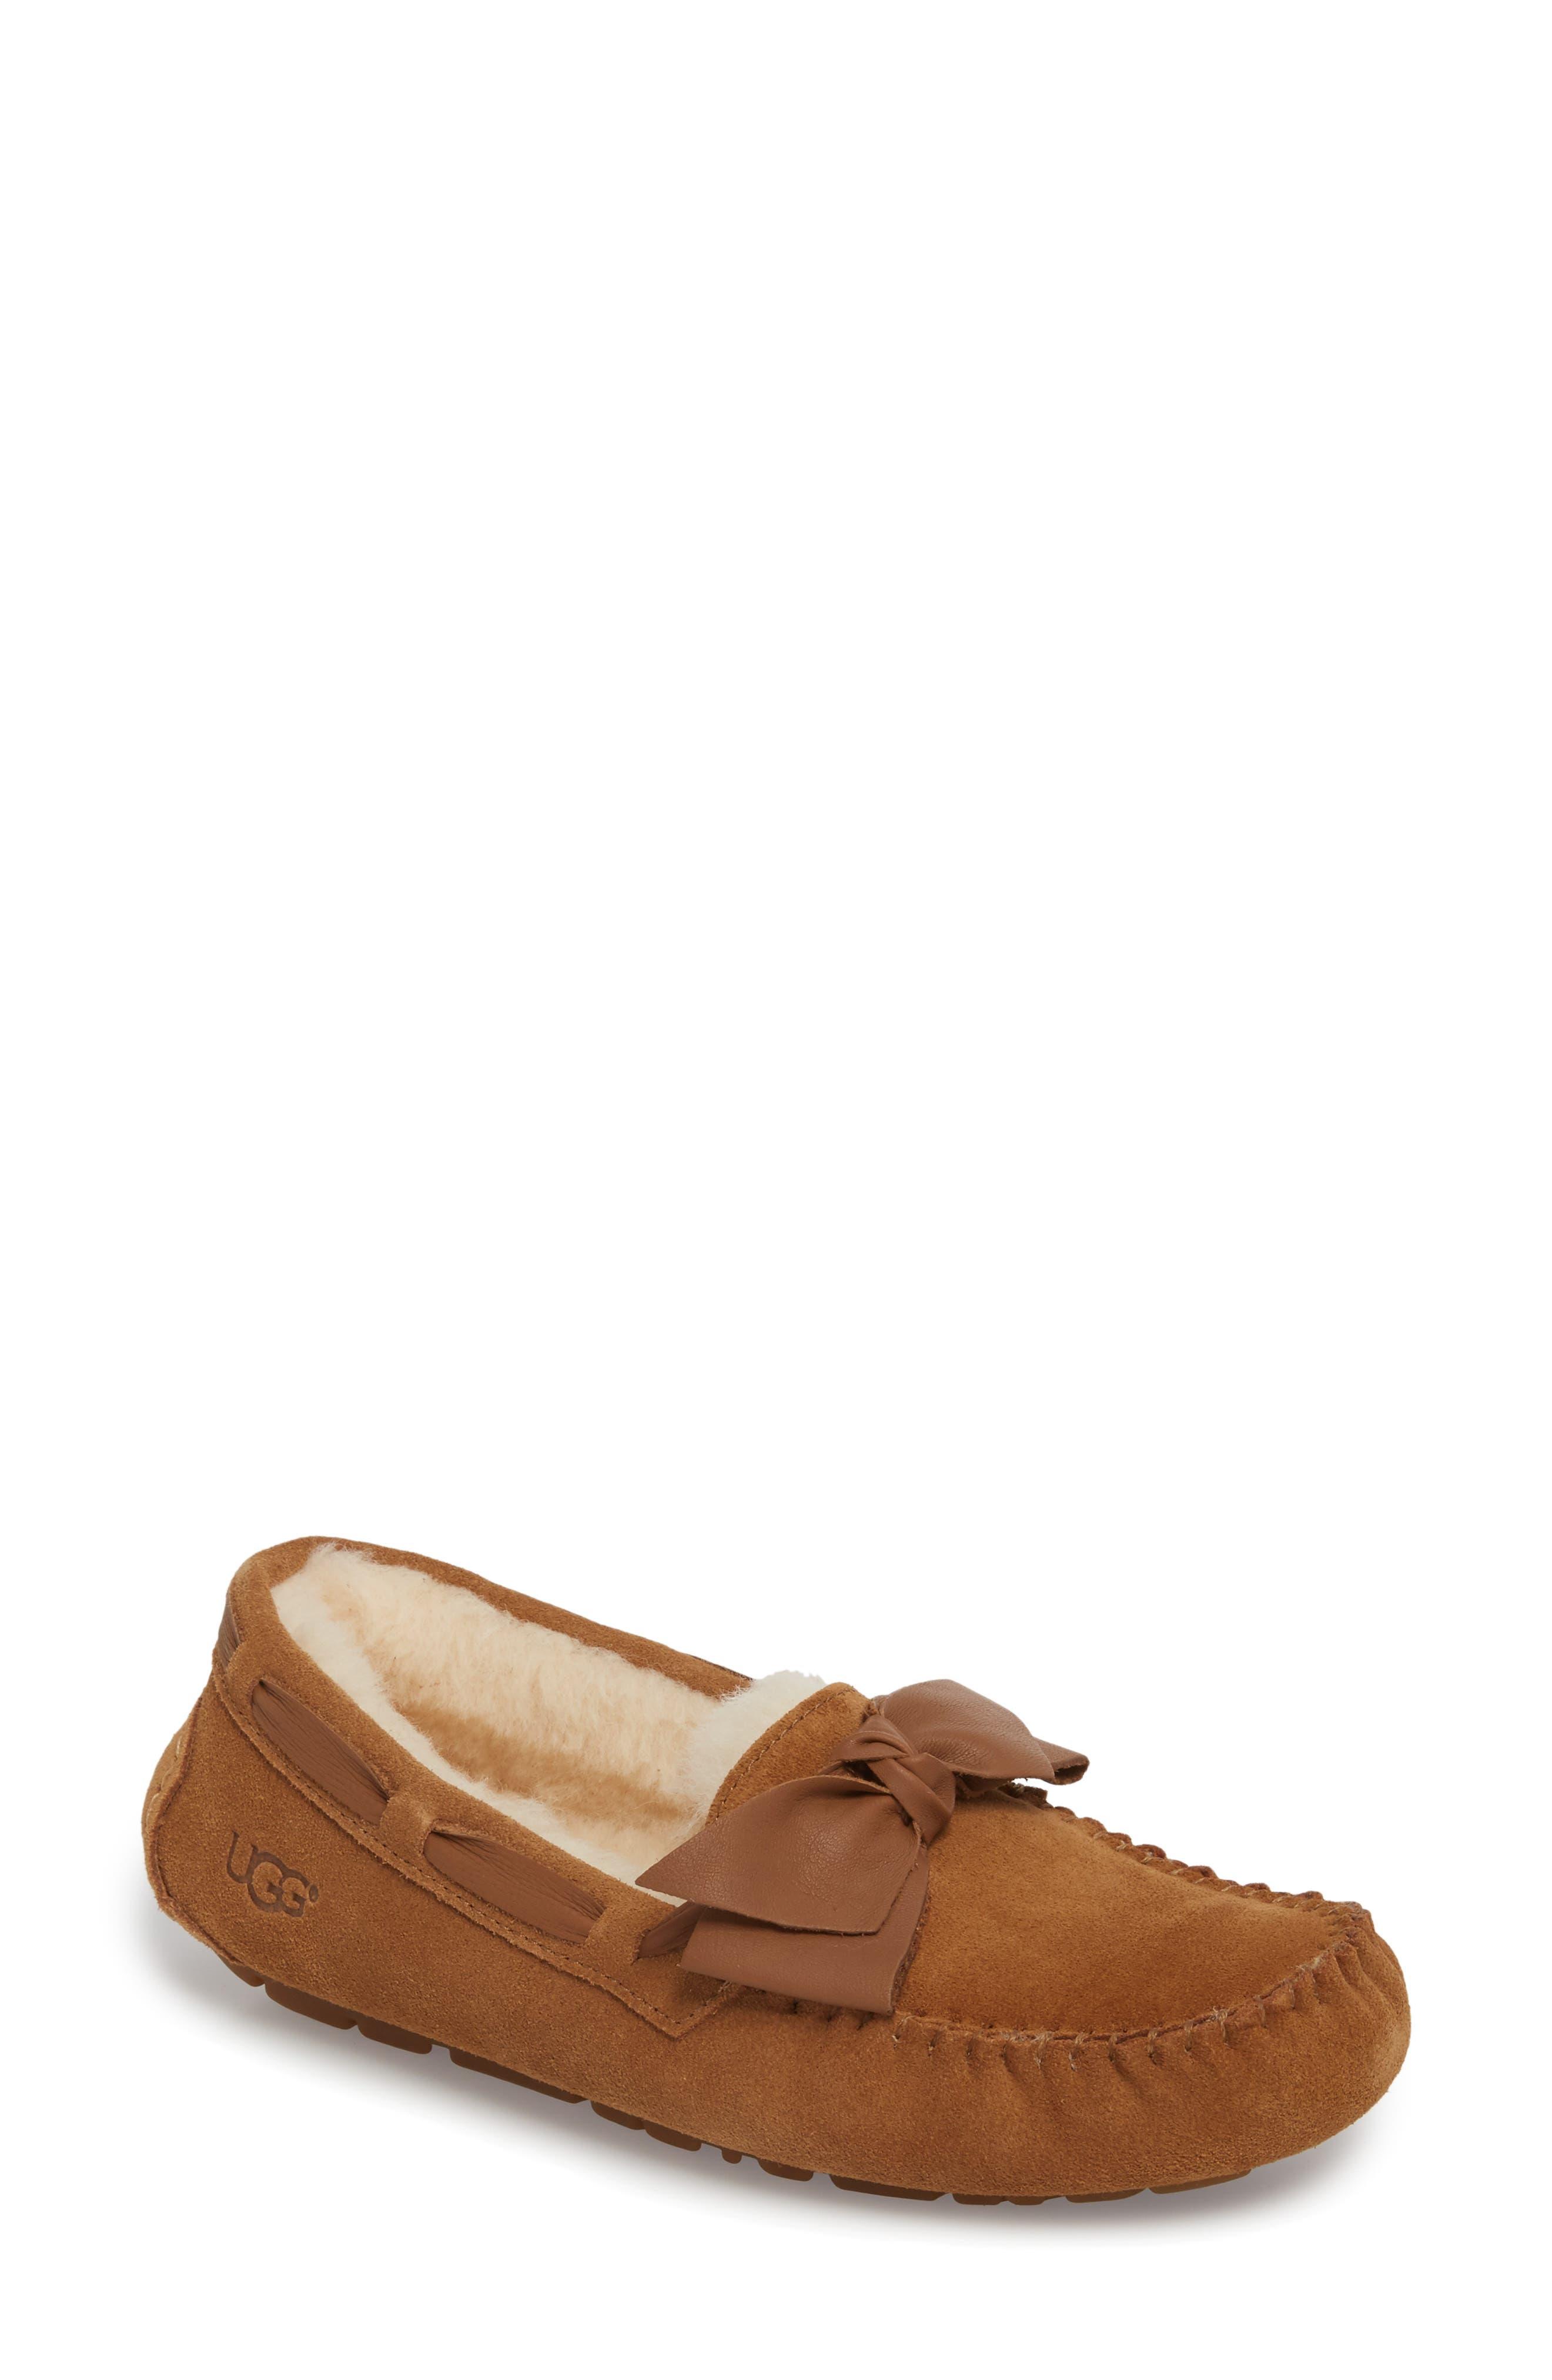 Dakota Bow Slipper, Main, color, Chestnut Suede